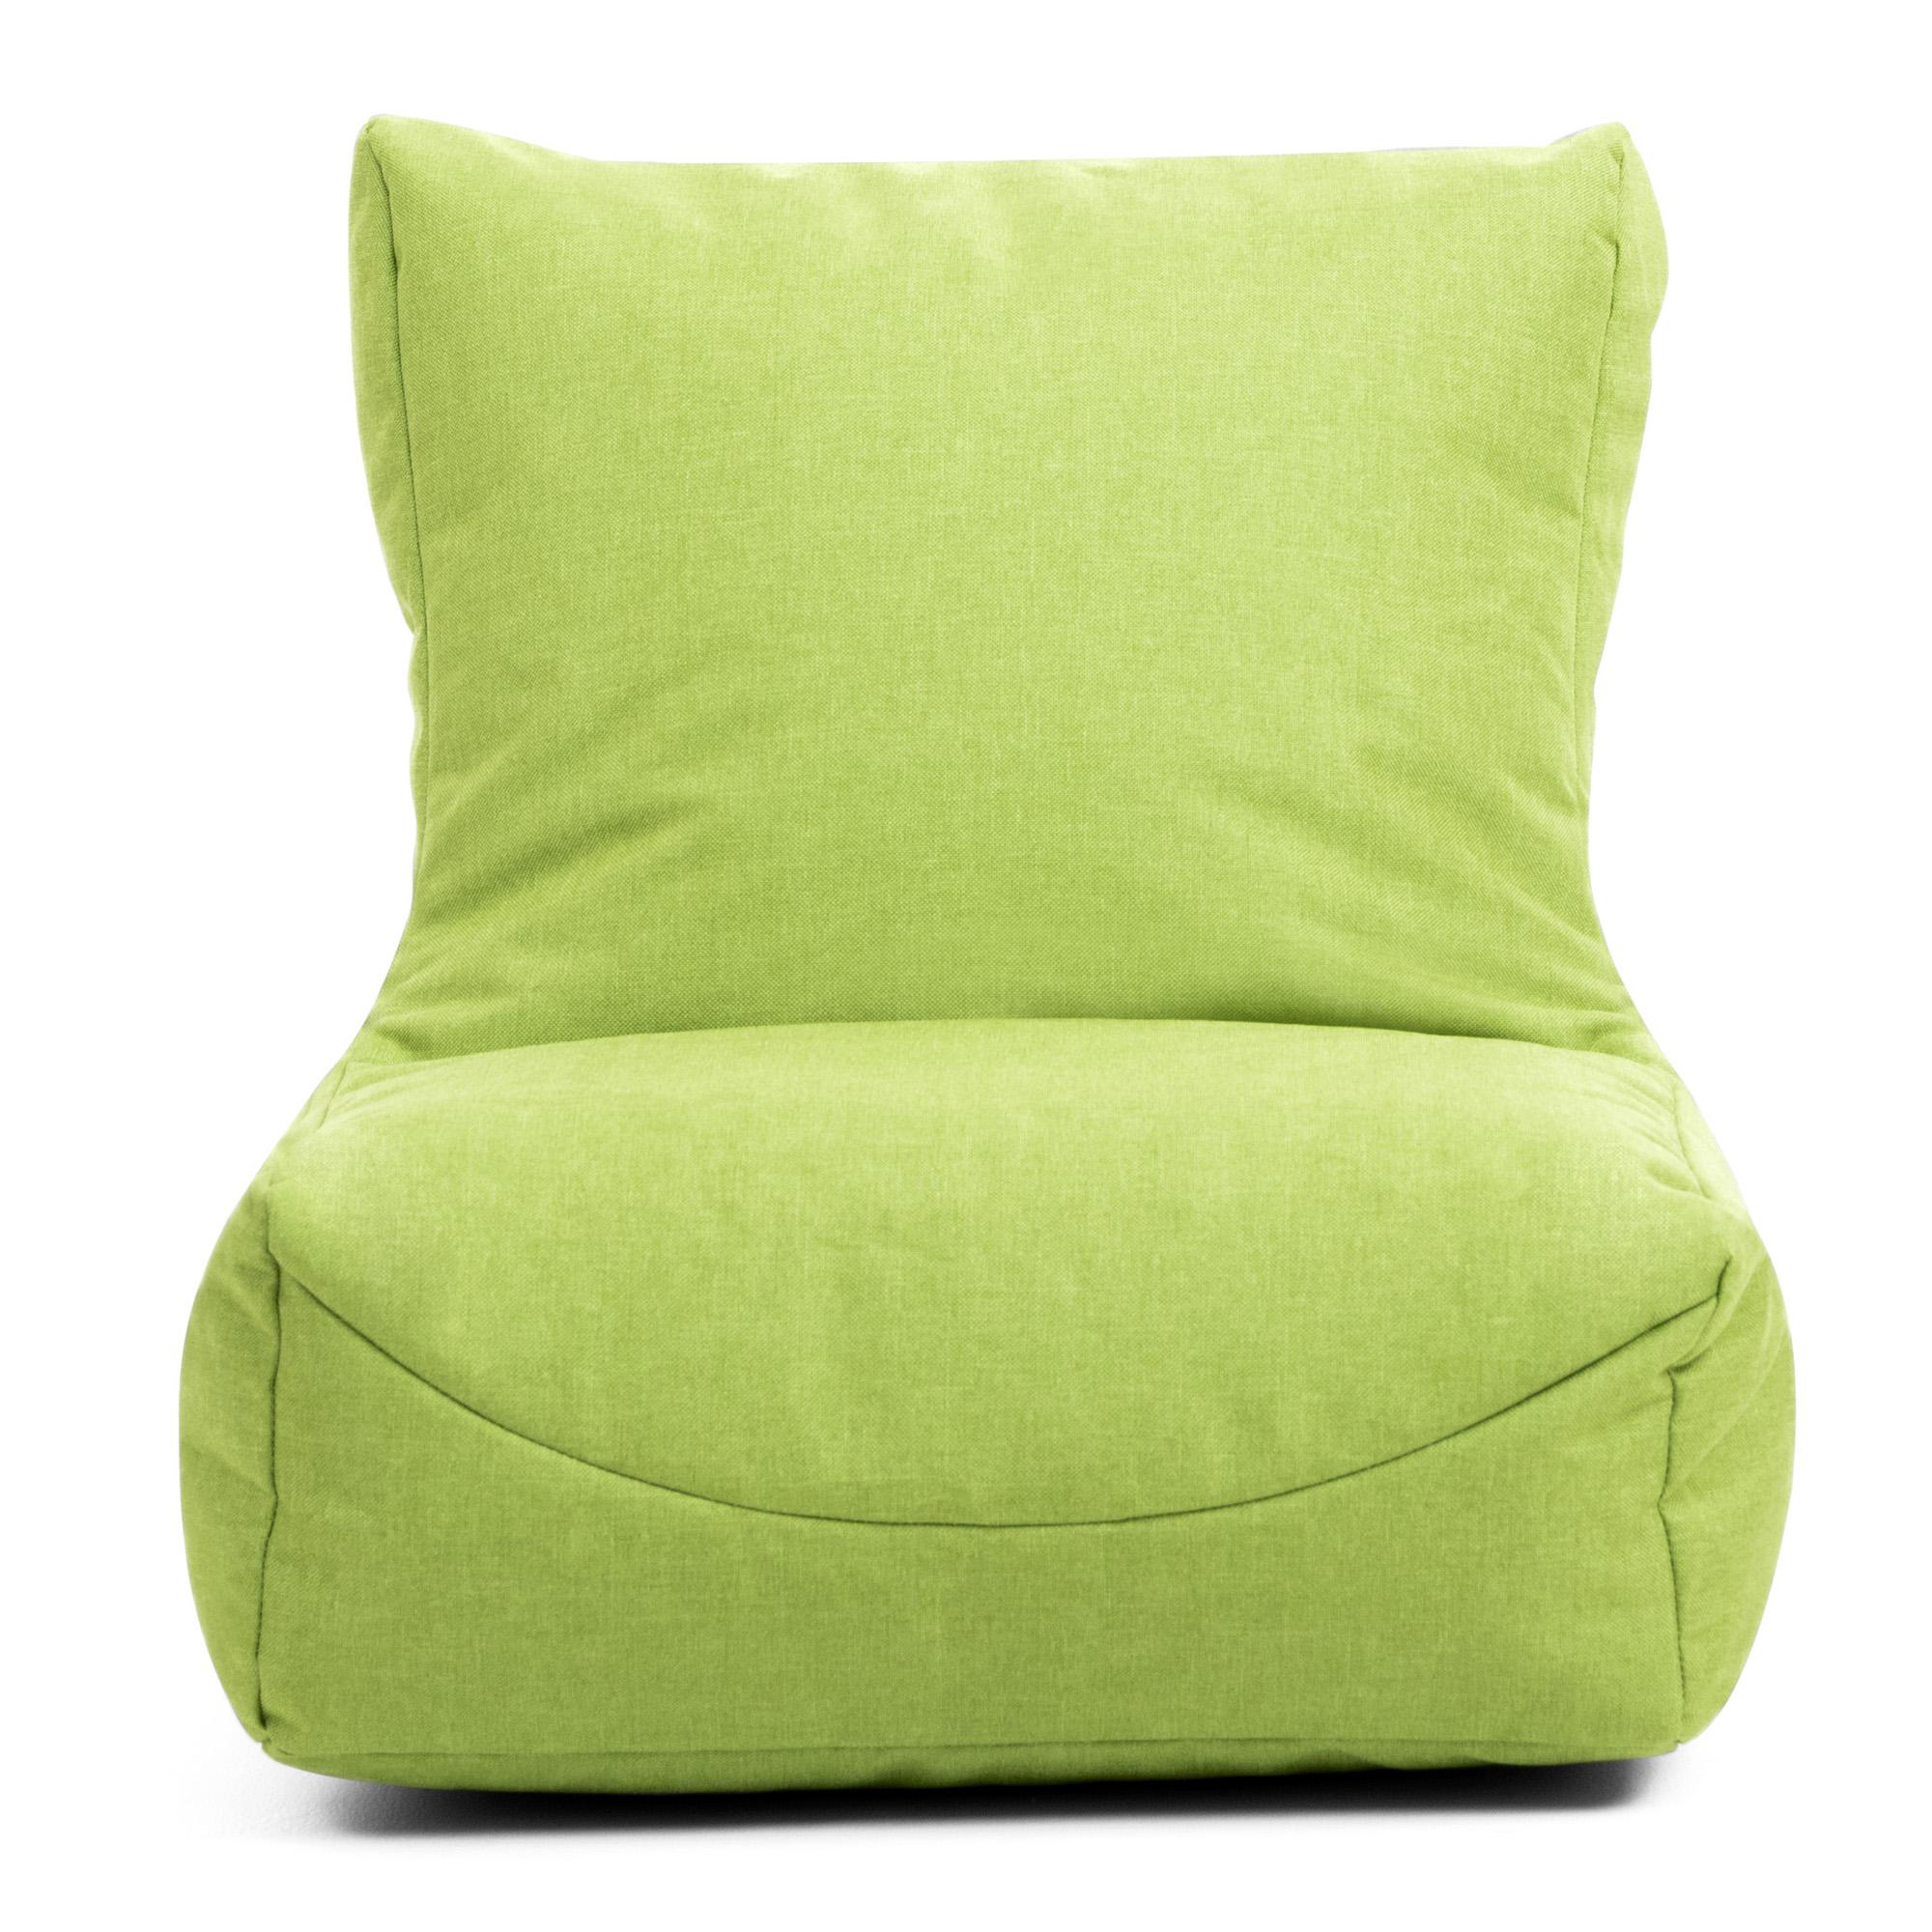 Eden-EY-Smile-Chair-Lime-1-300dpi